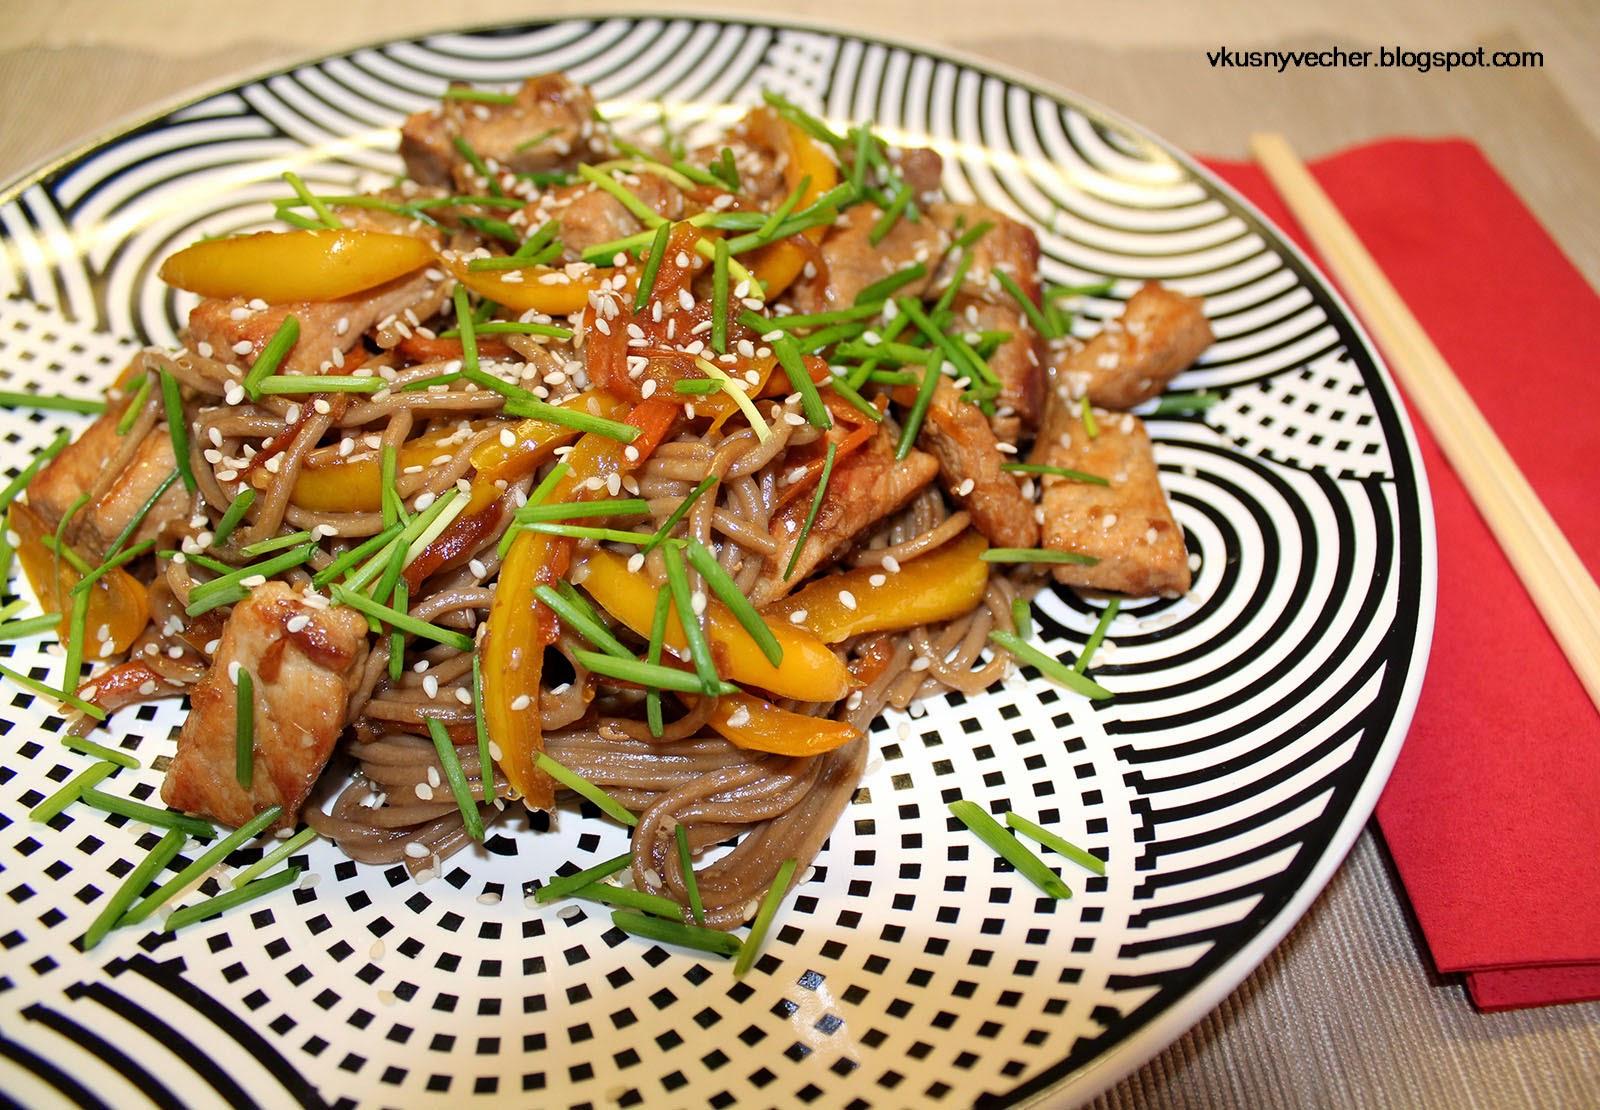 Рыба в соусе терияки рецепт пошагово